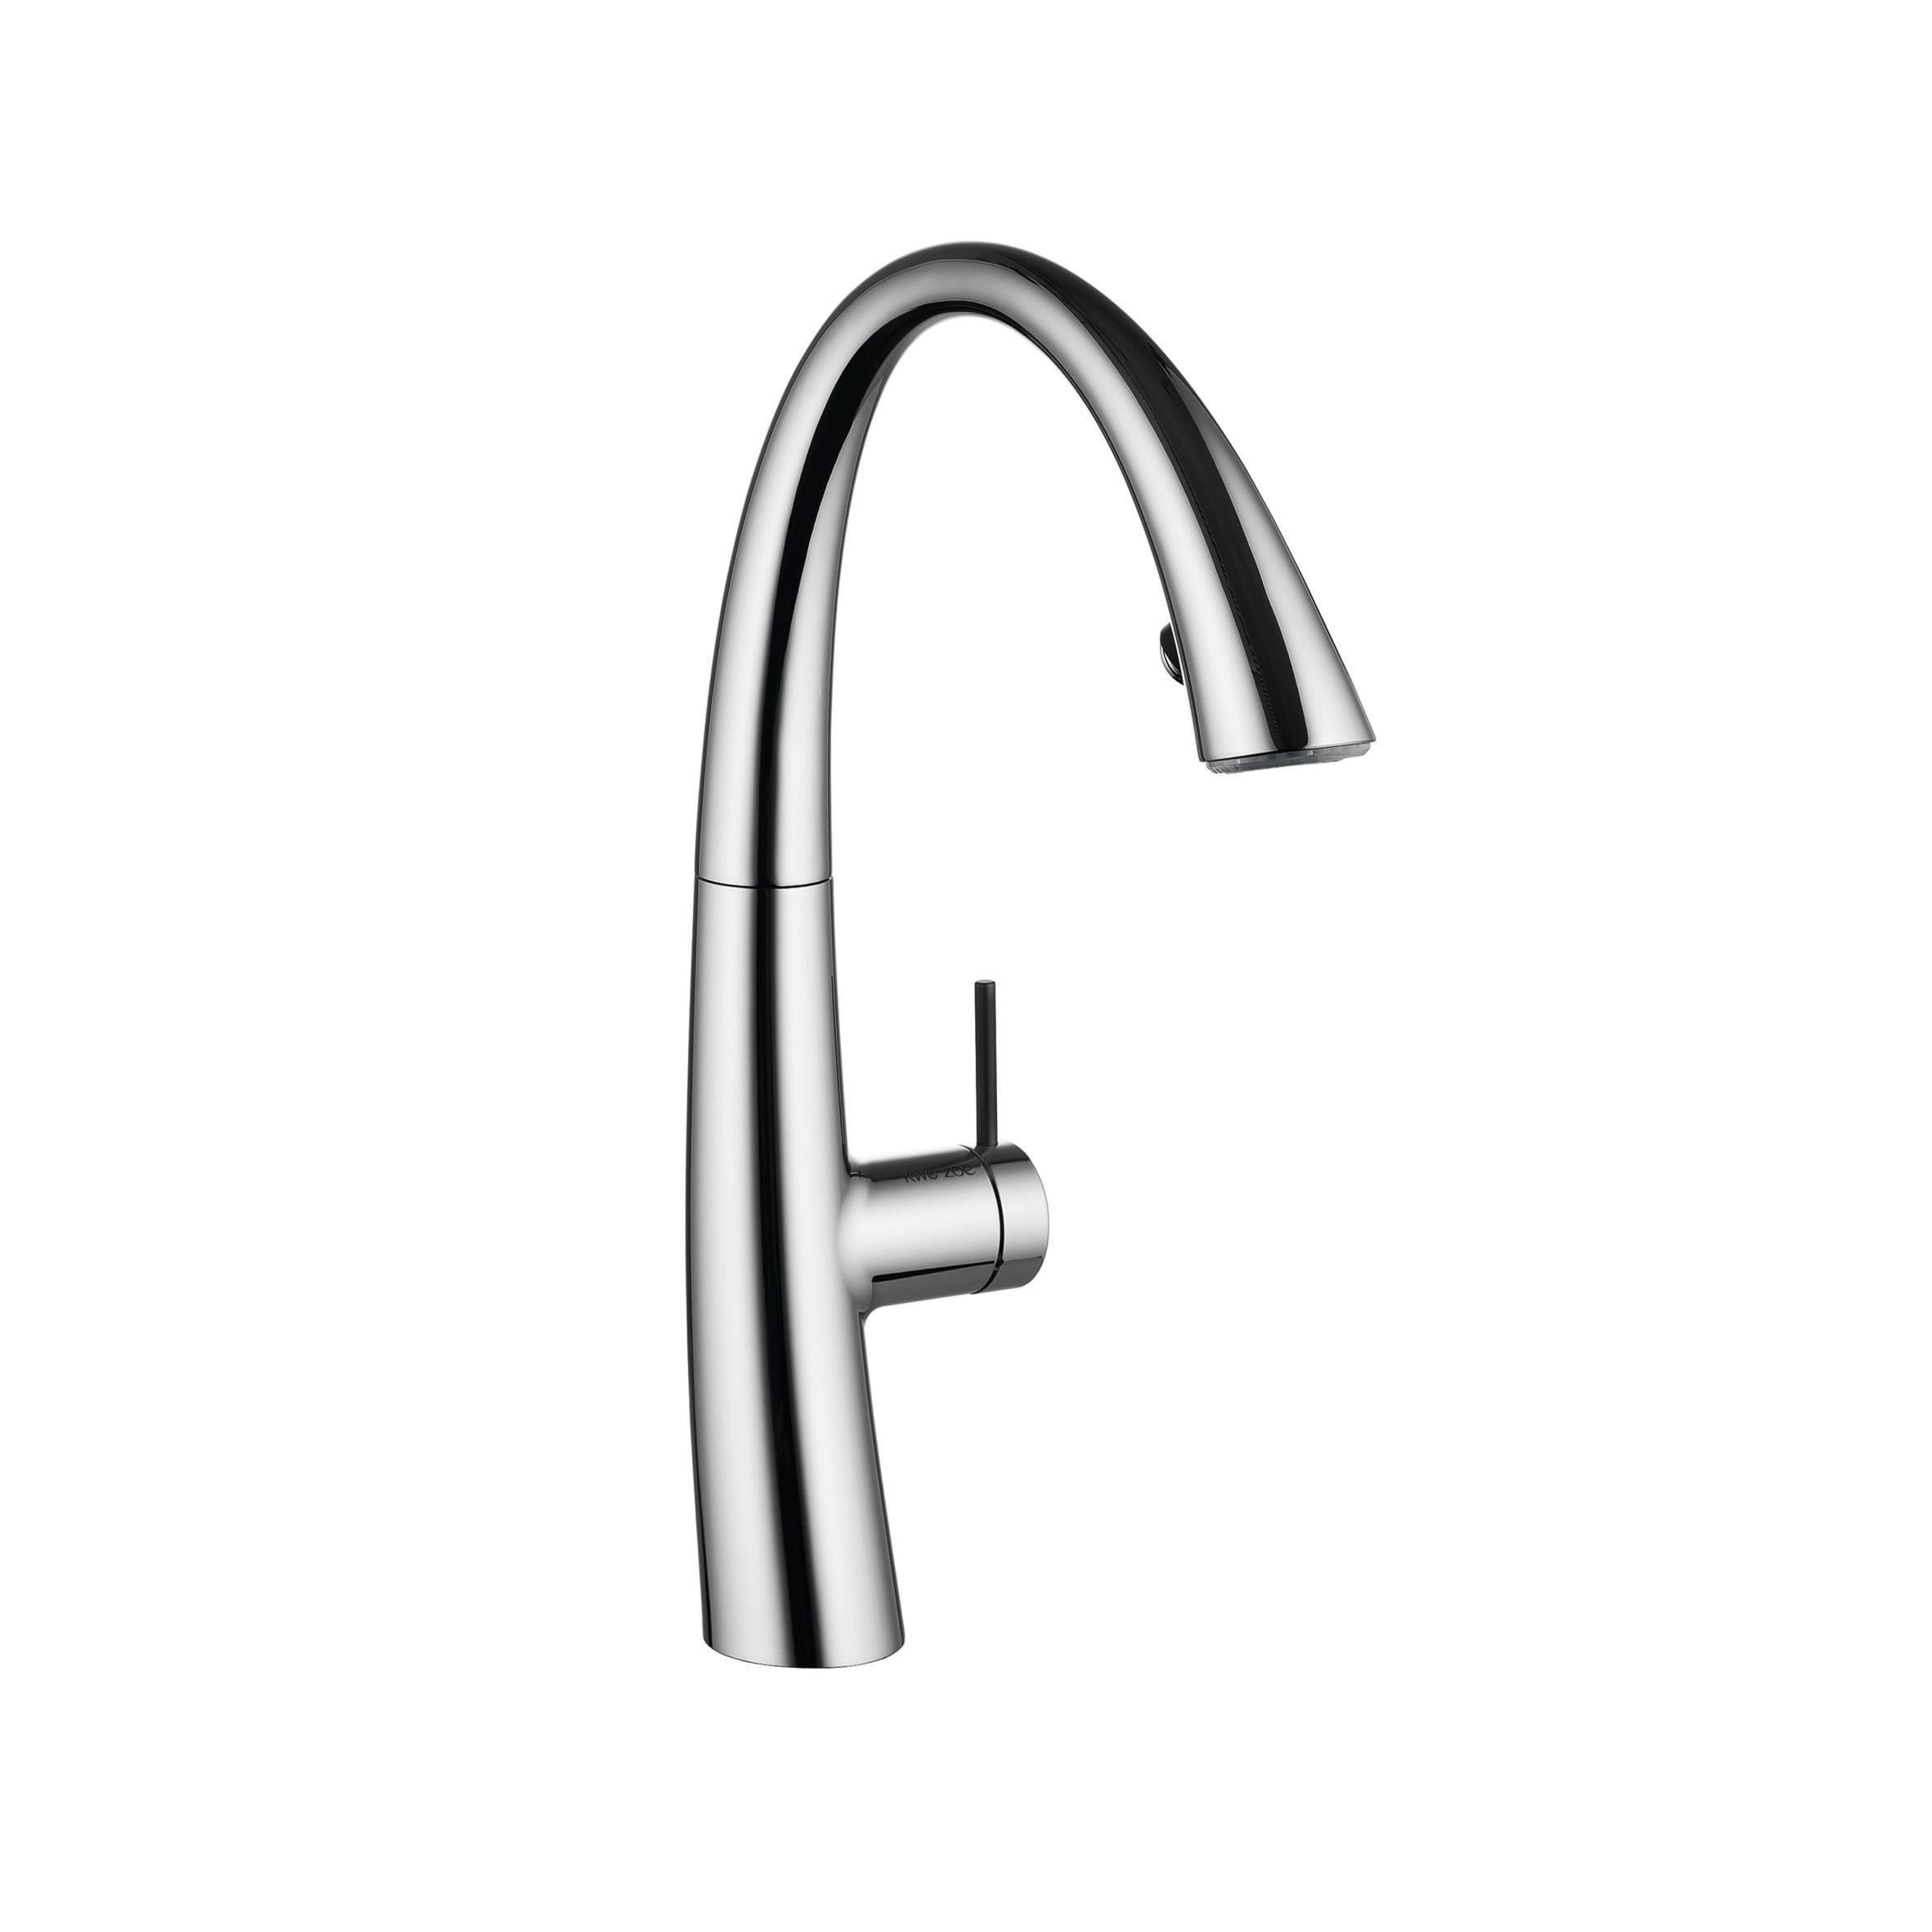 kitchen kwc zoe chromeline faucets com product with qualitybath light faucet single lever htm